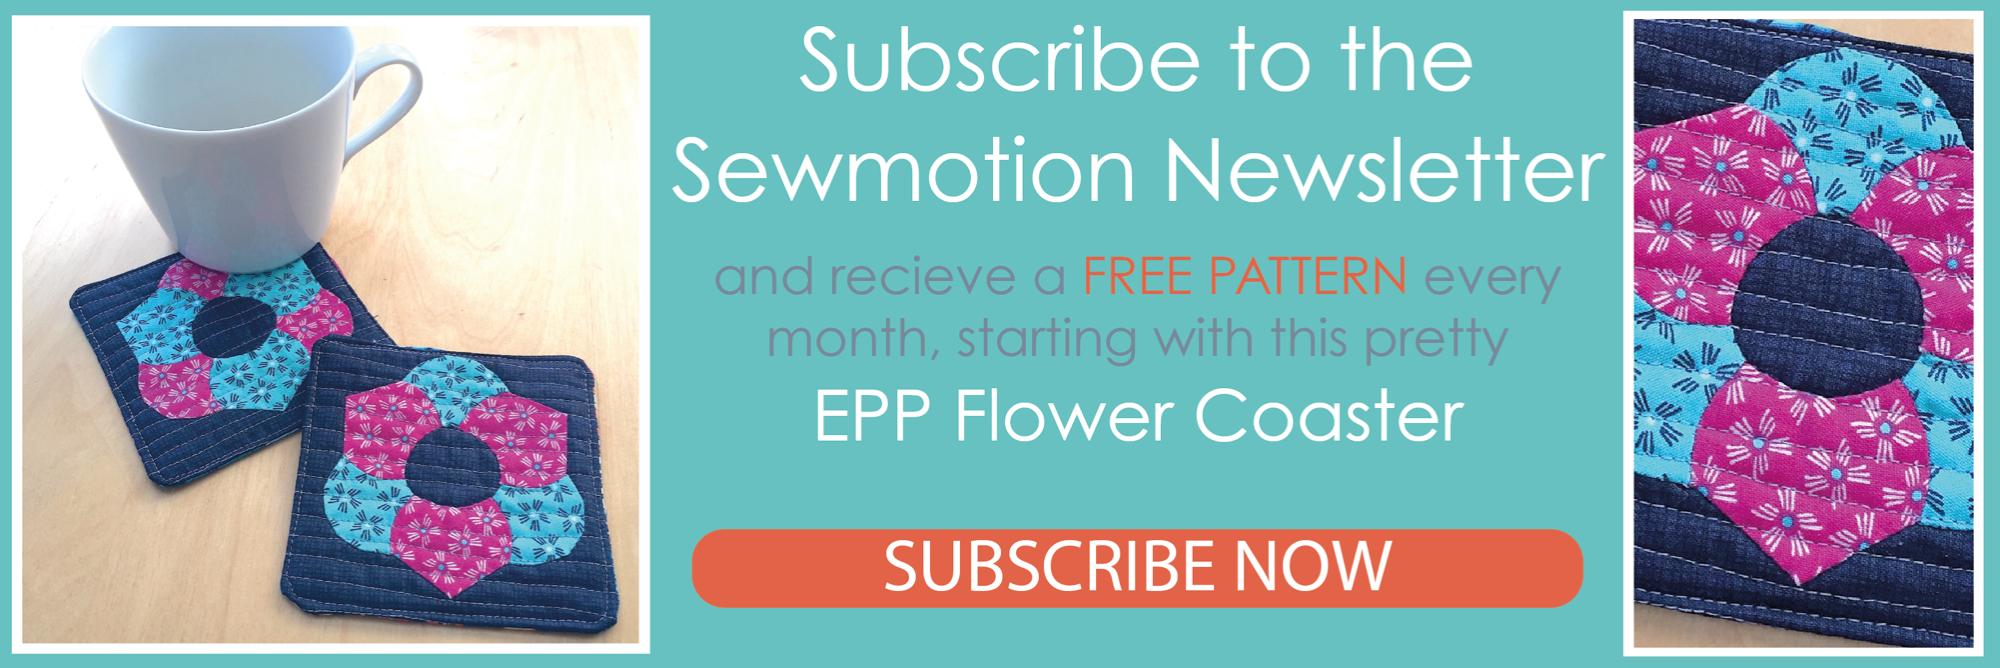 Newsletter free pattern coasters Feb2020